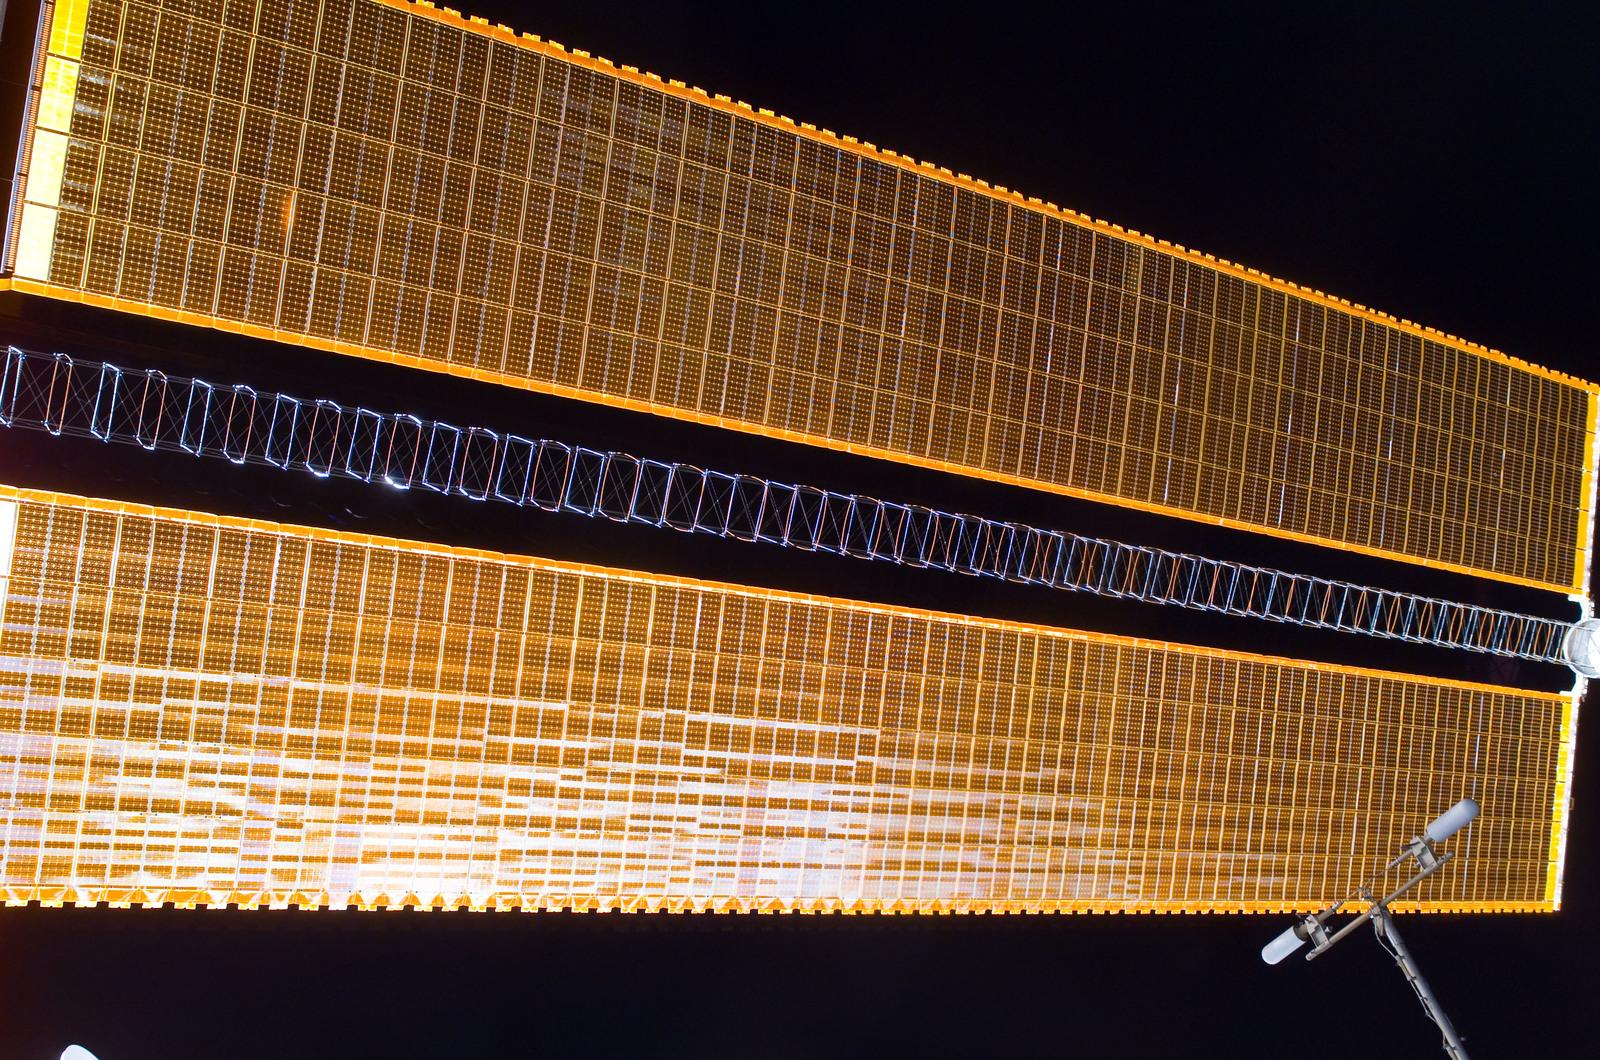 S116E05412 - STS-116 - P4 Truss SAW